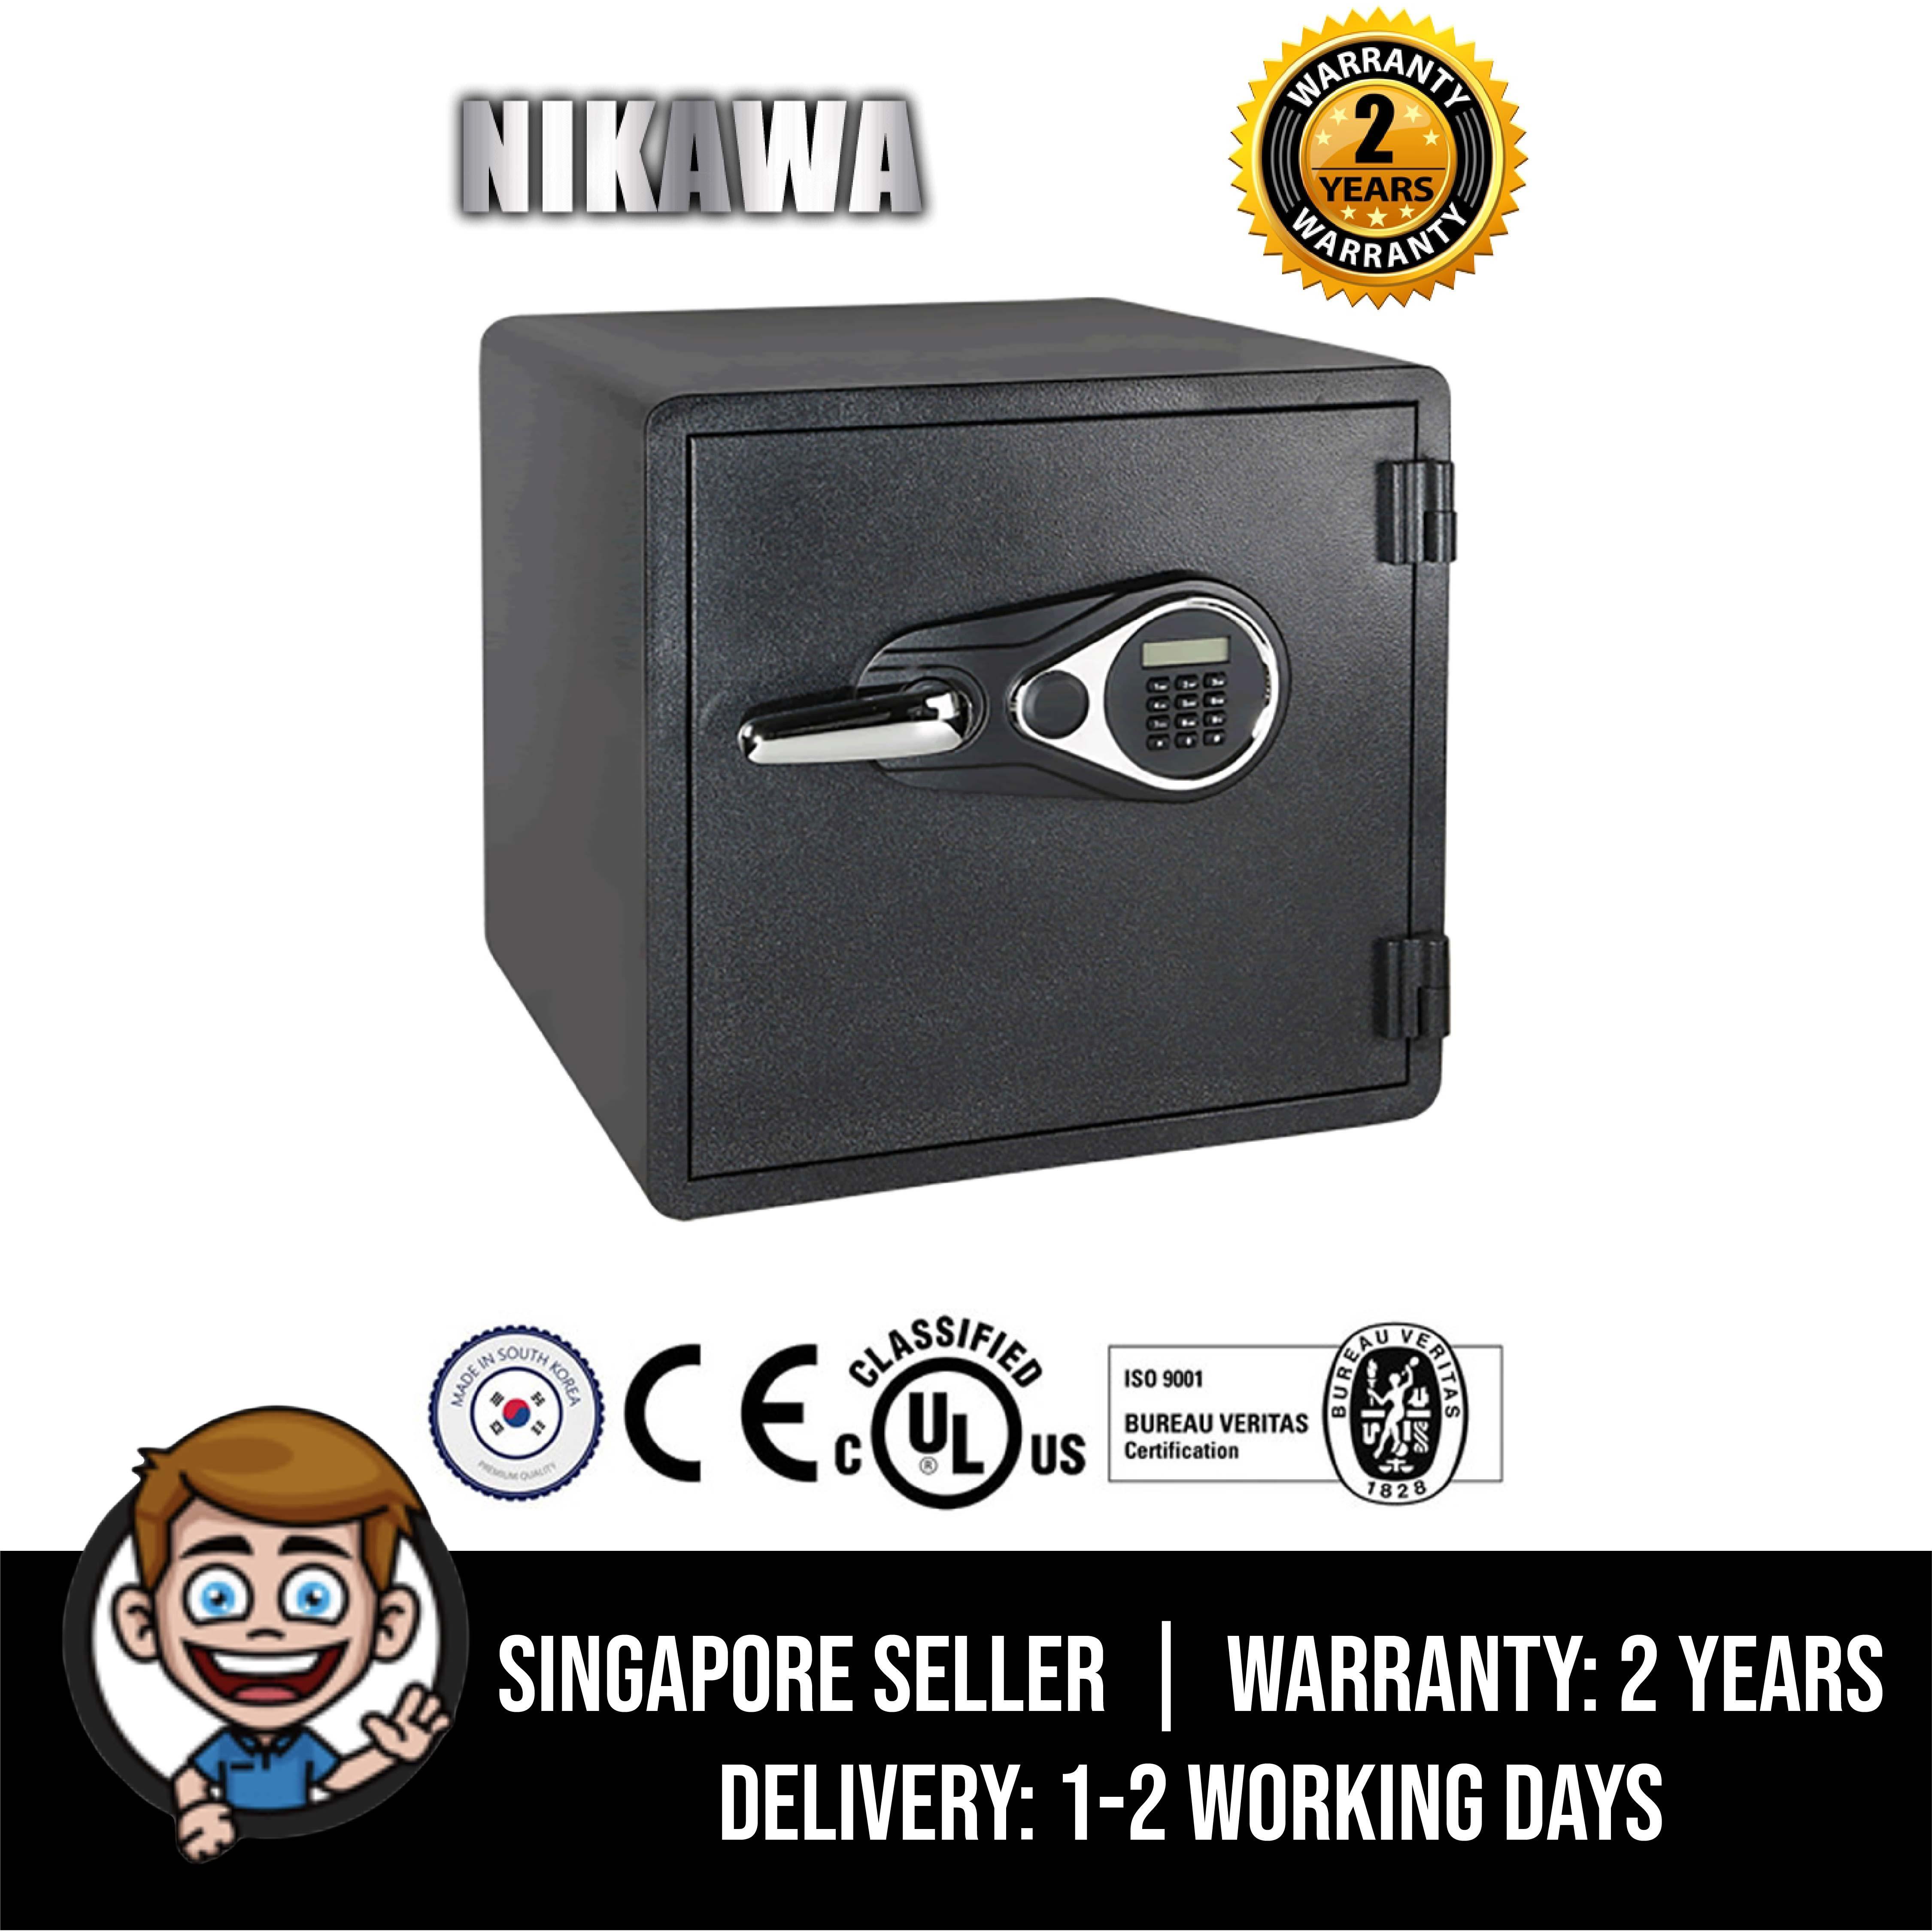 Nikawa SWF Electronic Safe 1818E